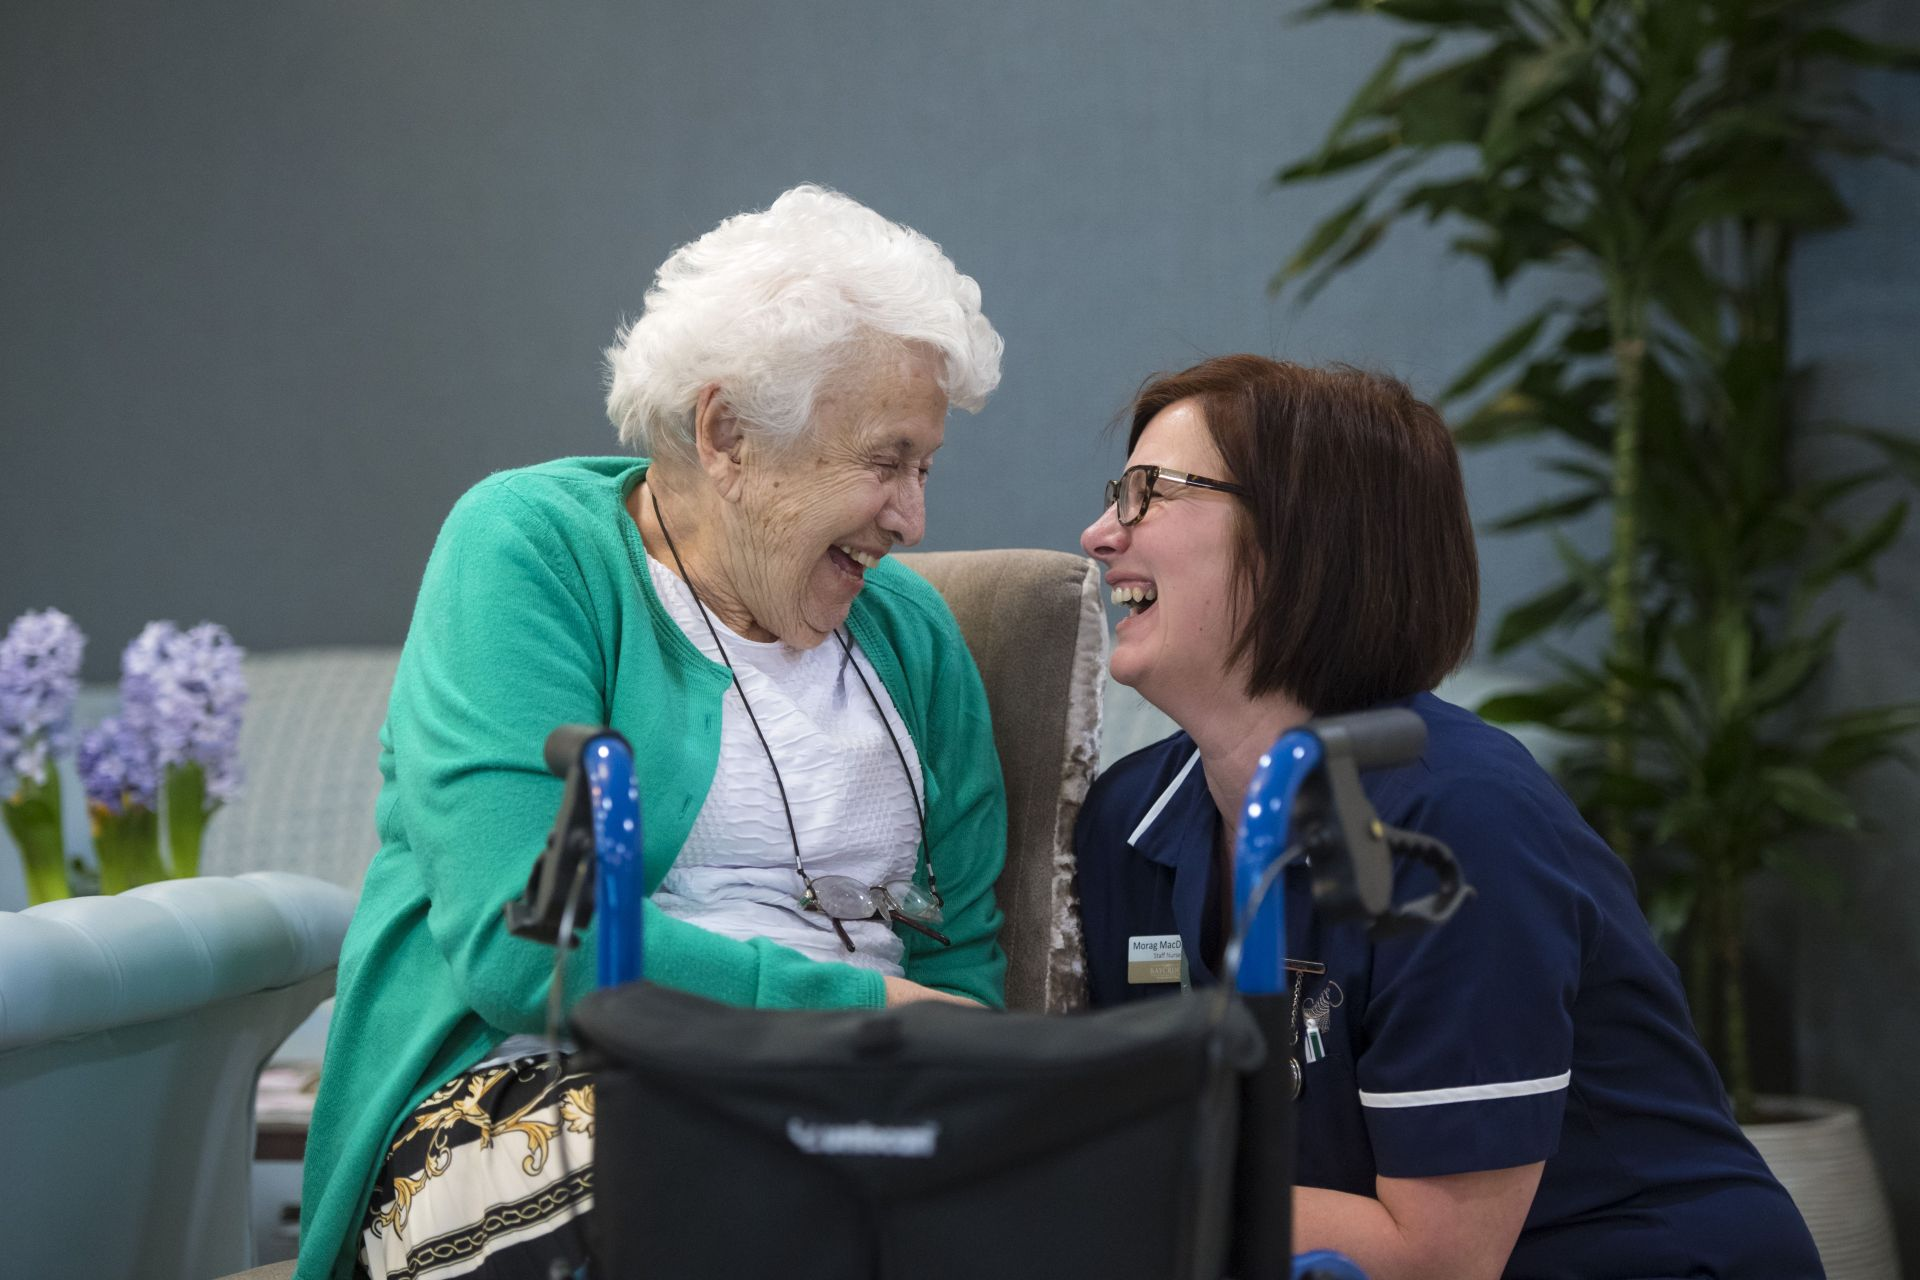 Delivering Better Care at BayCroft Care Homes